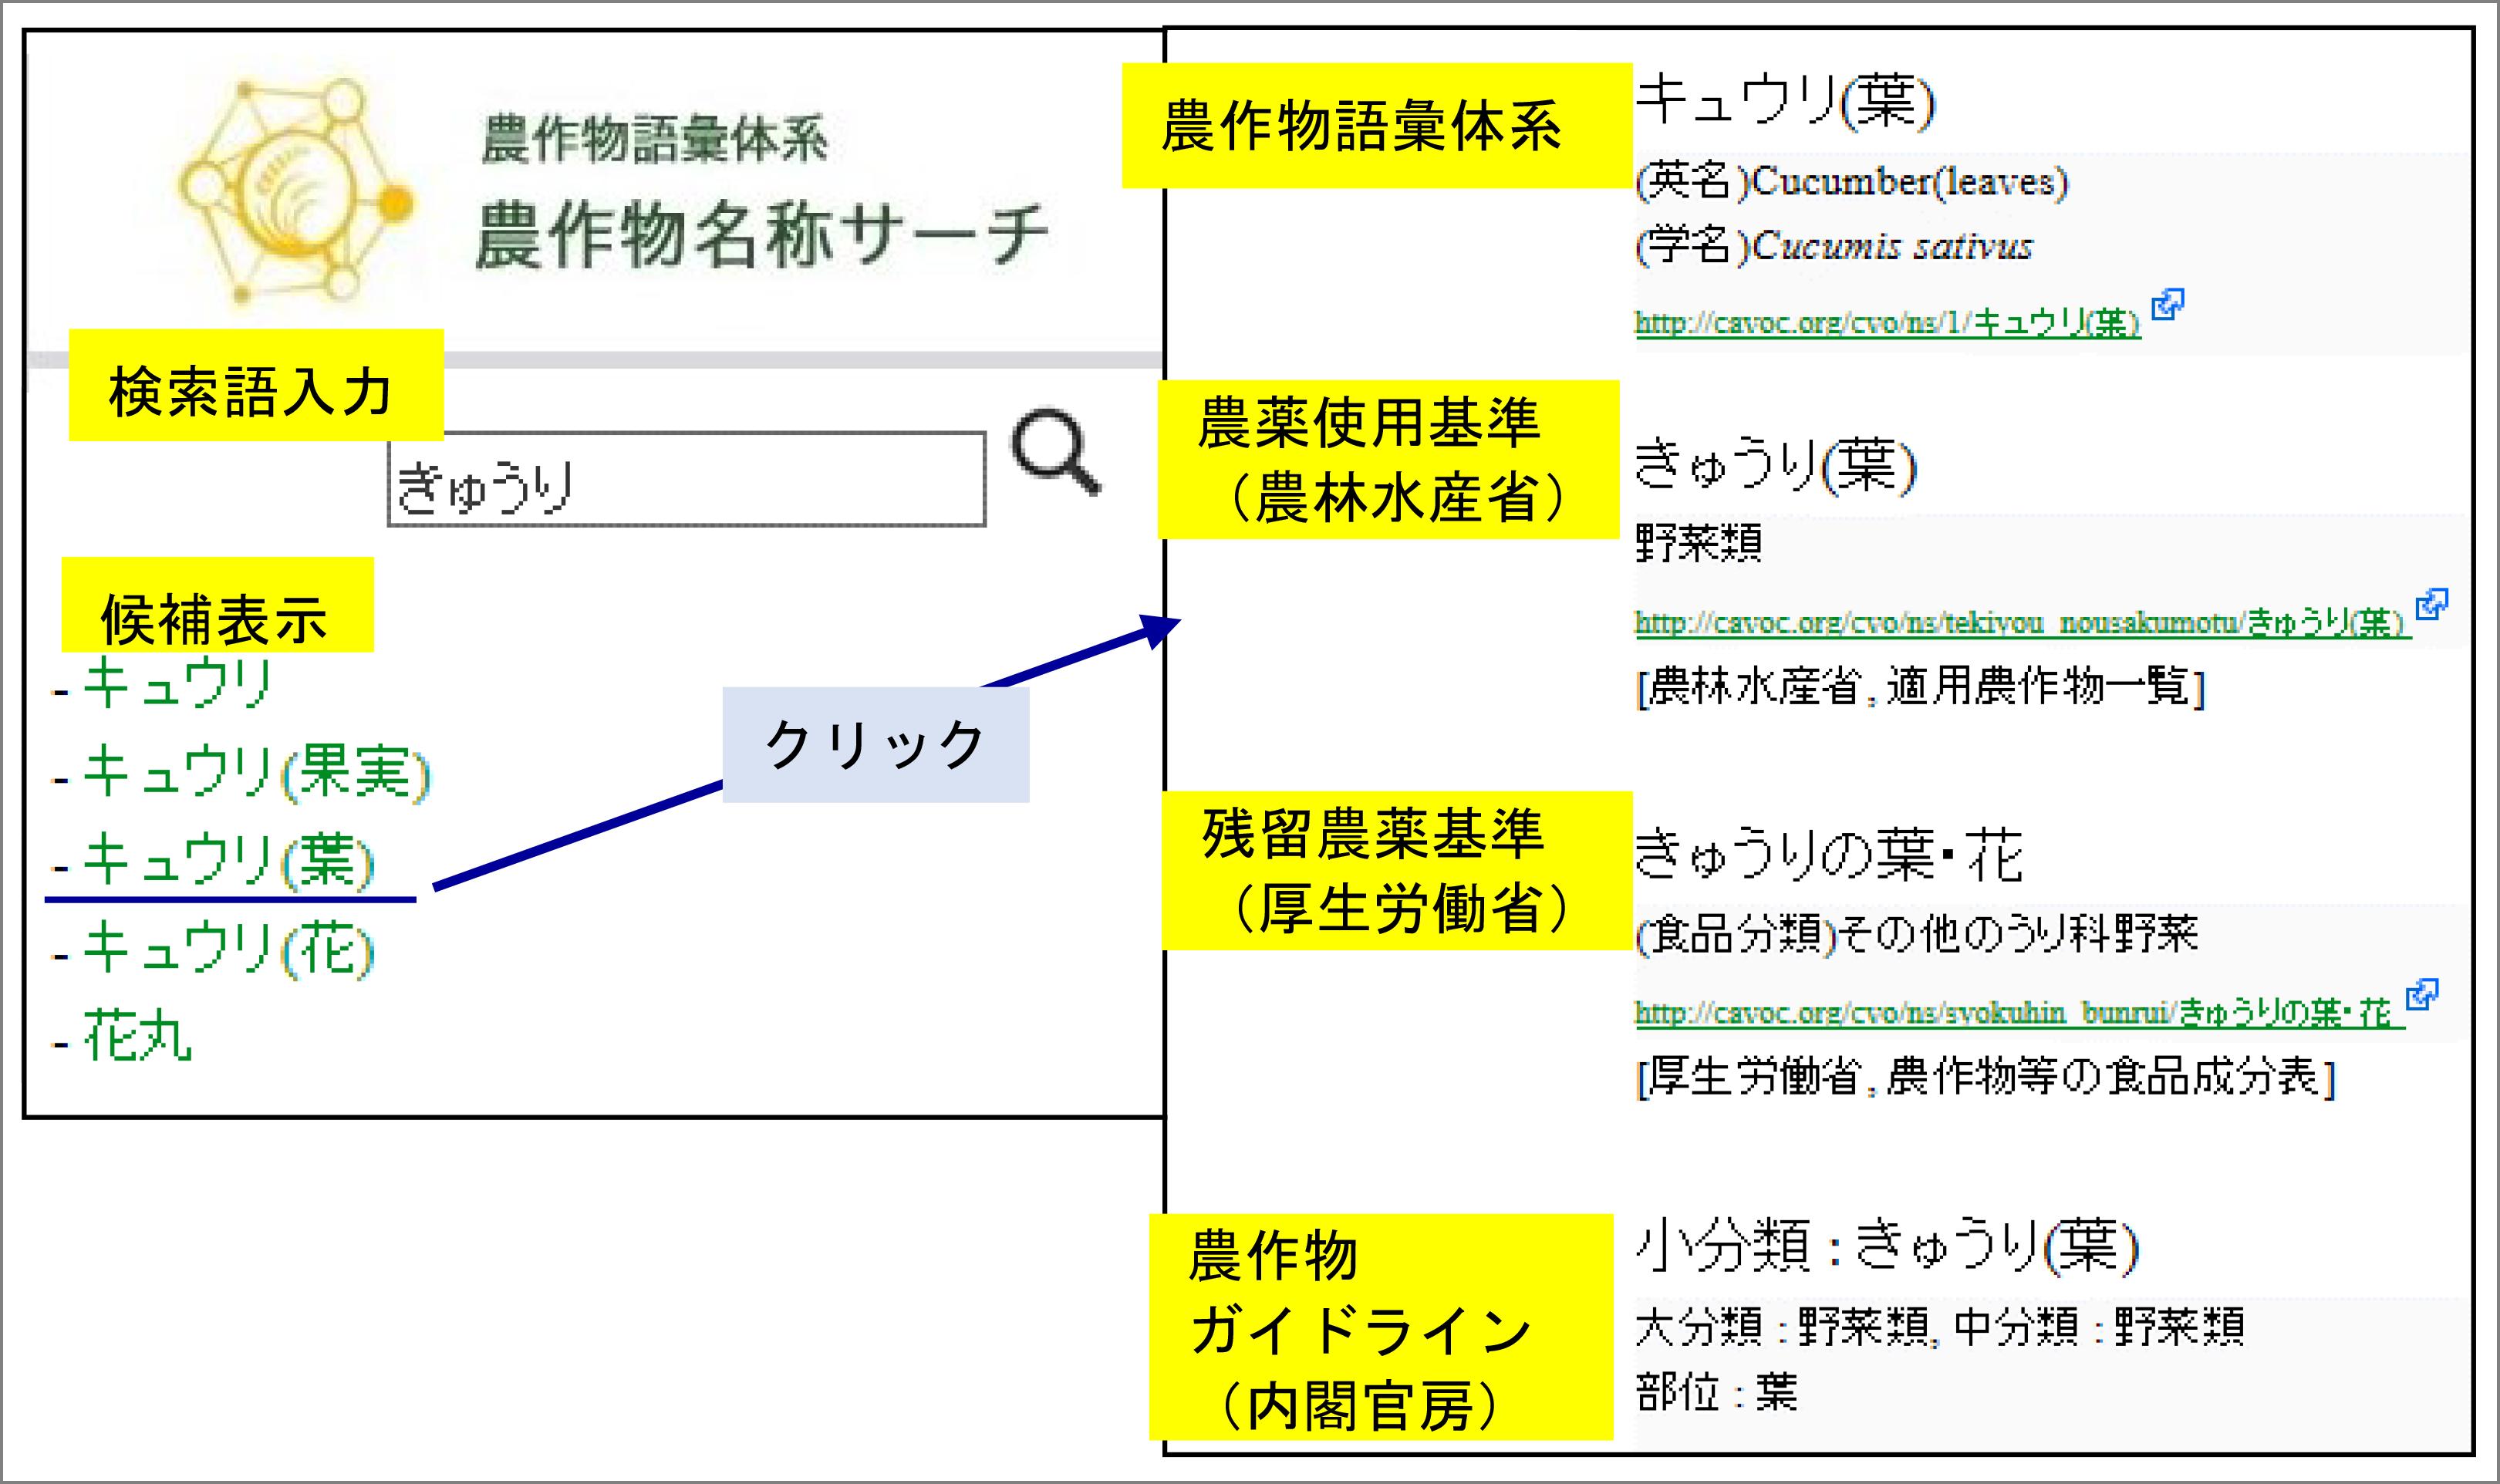 nii_newsrelease_20190403_image1.png